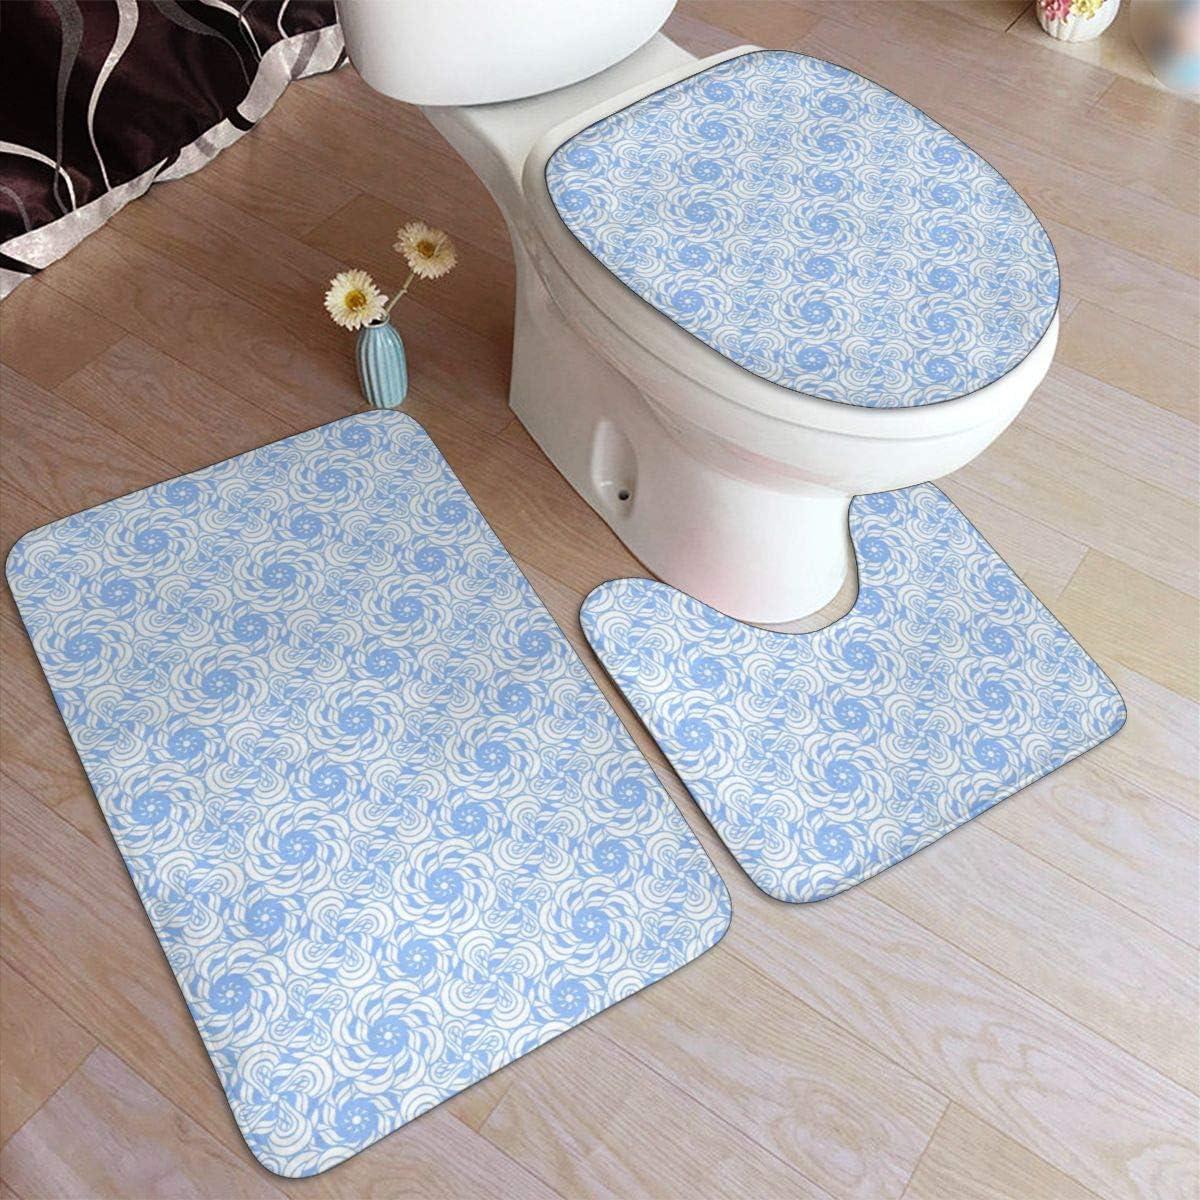 Bathroom Mat Set Non Slip Bath Shower Matt Rugs Carpet Toilet Lid Cover Mats